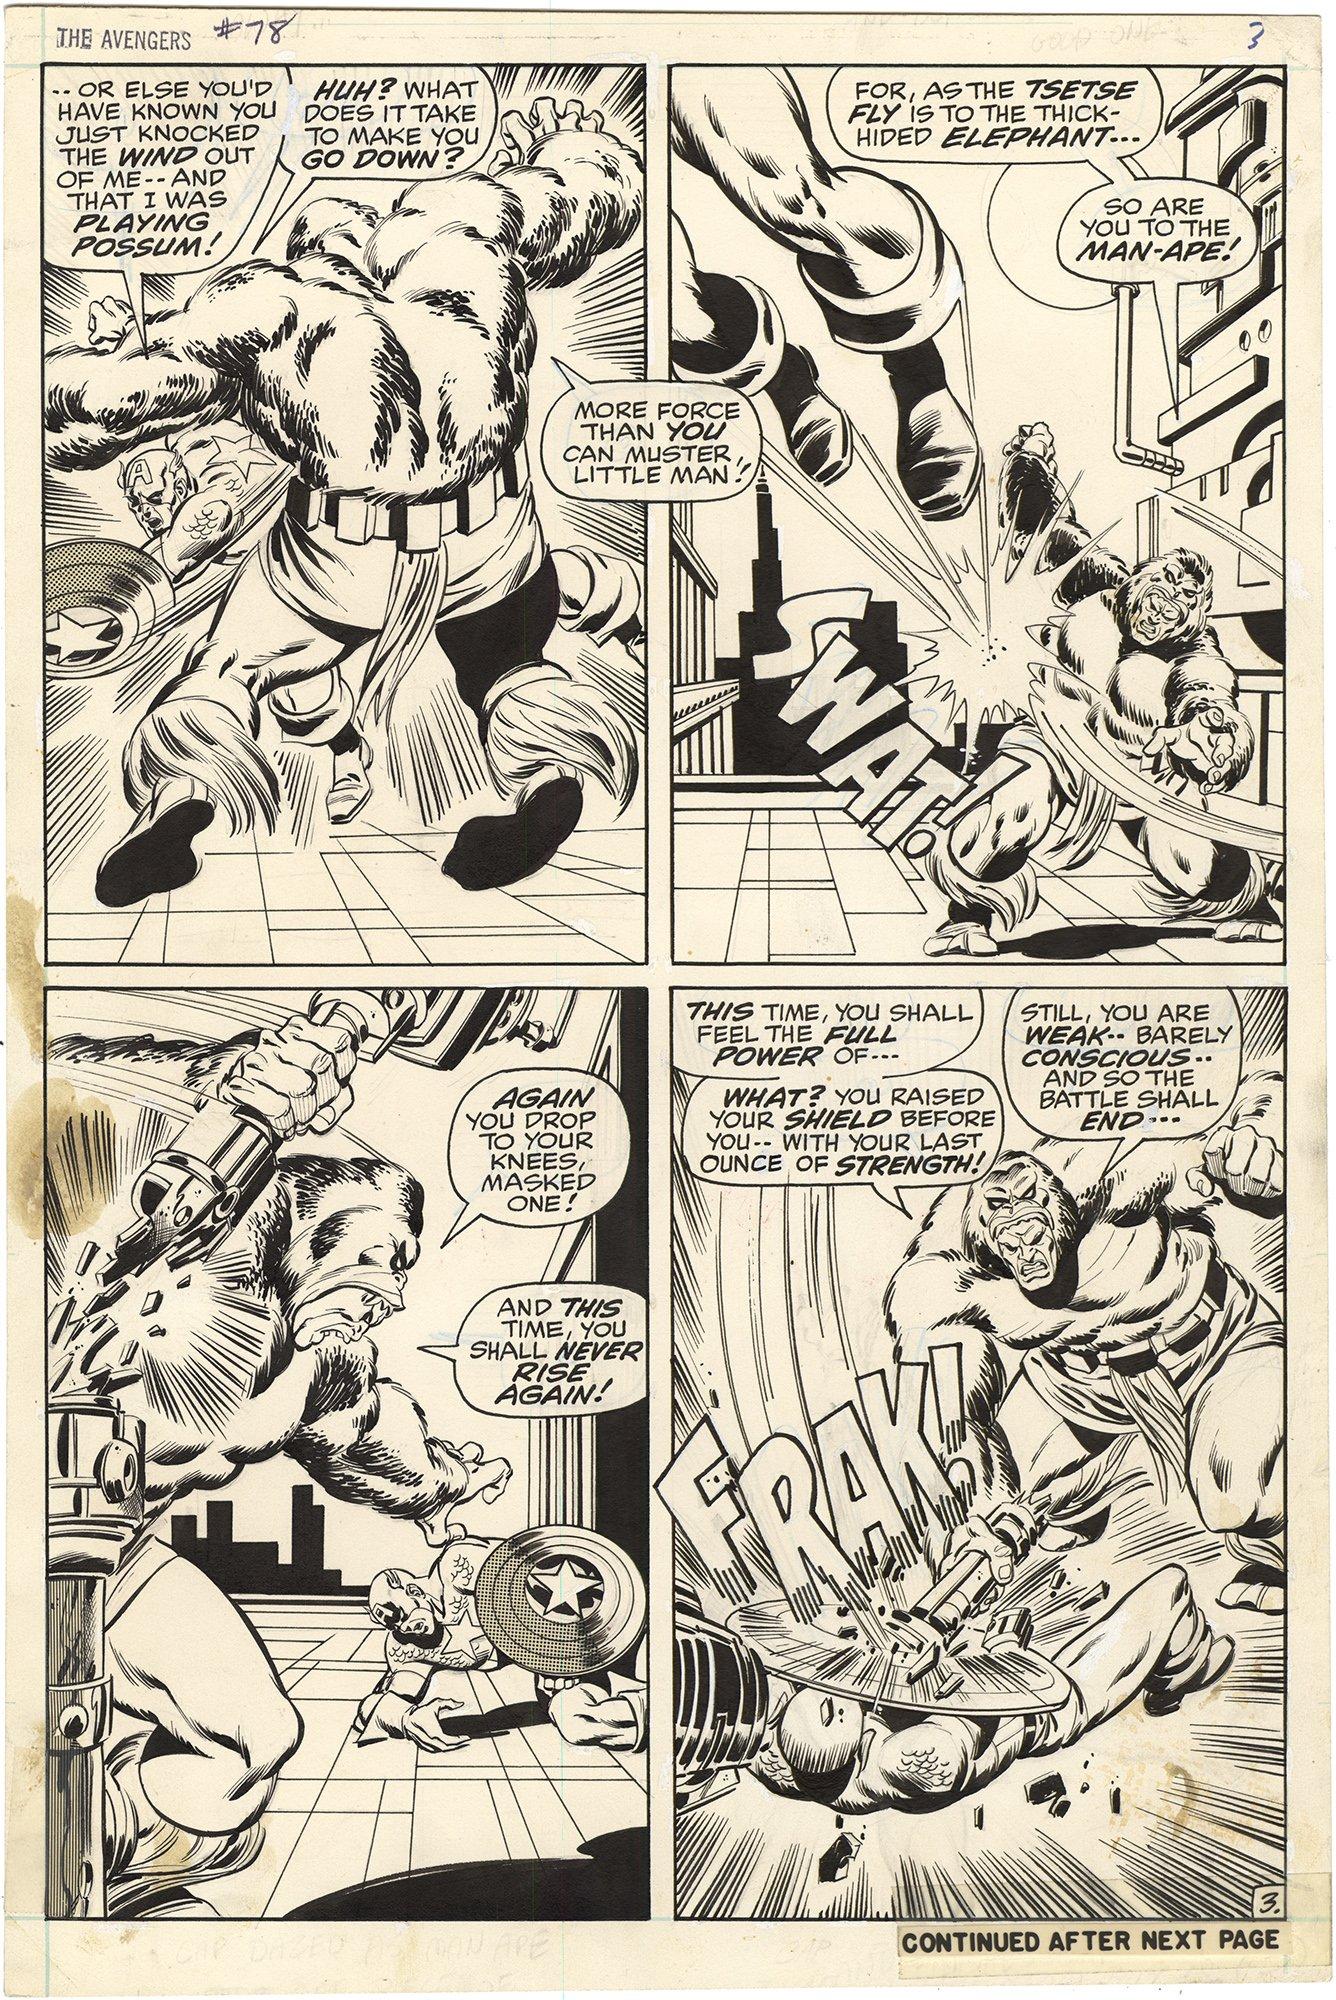 Avengers #78 p3